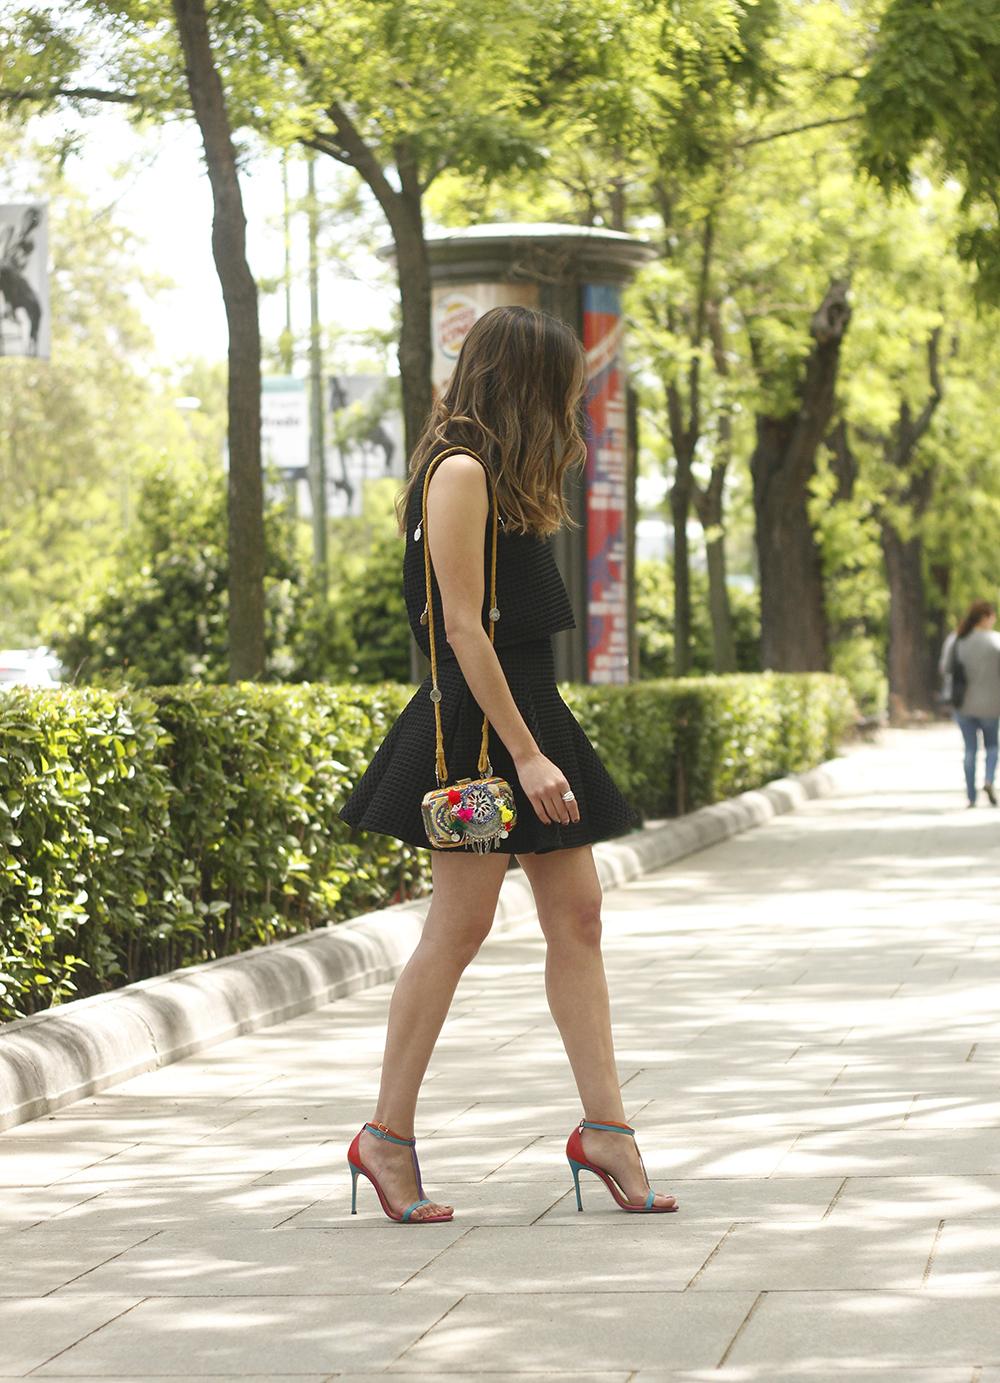 Little black dress maje carolina herrera sandals bag outfit fashion style summer sunnies09